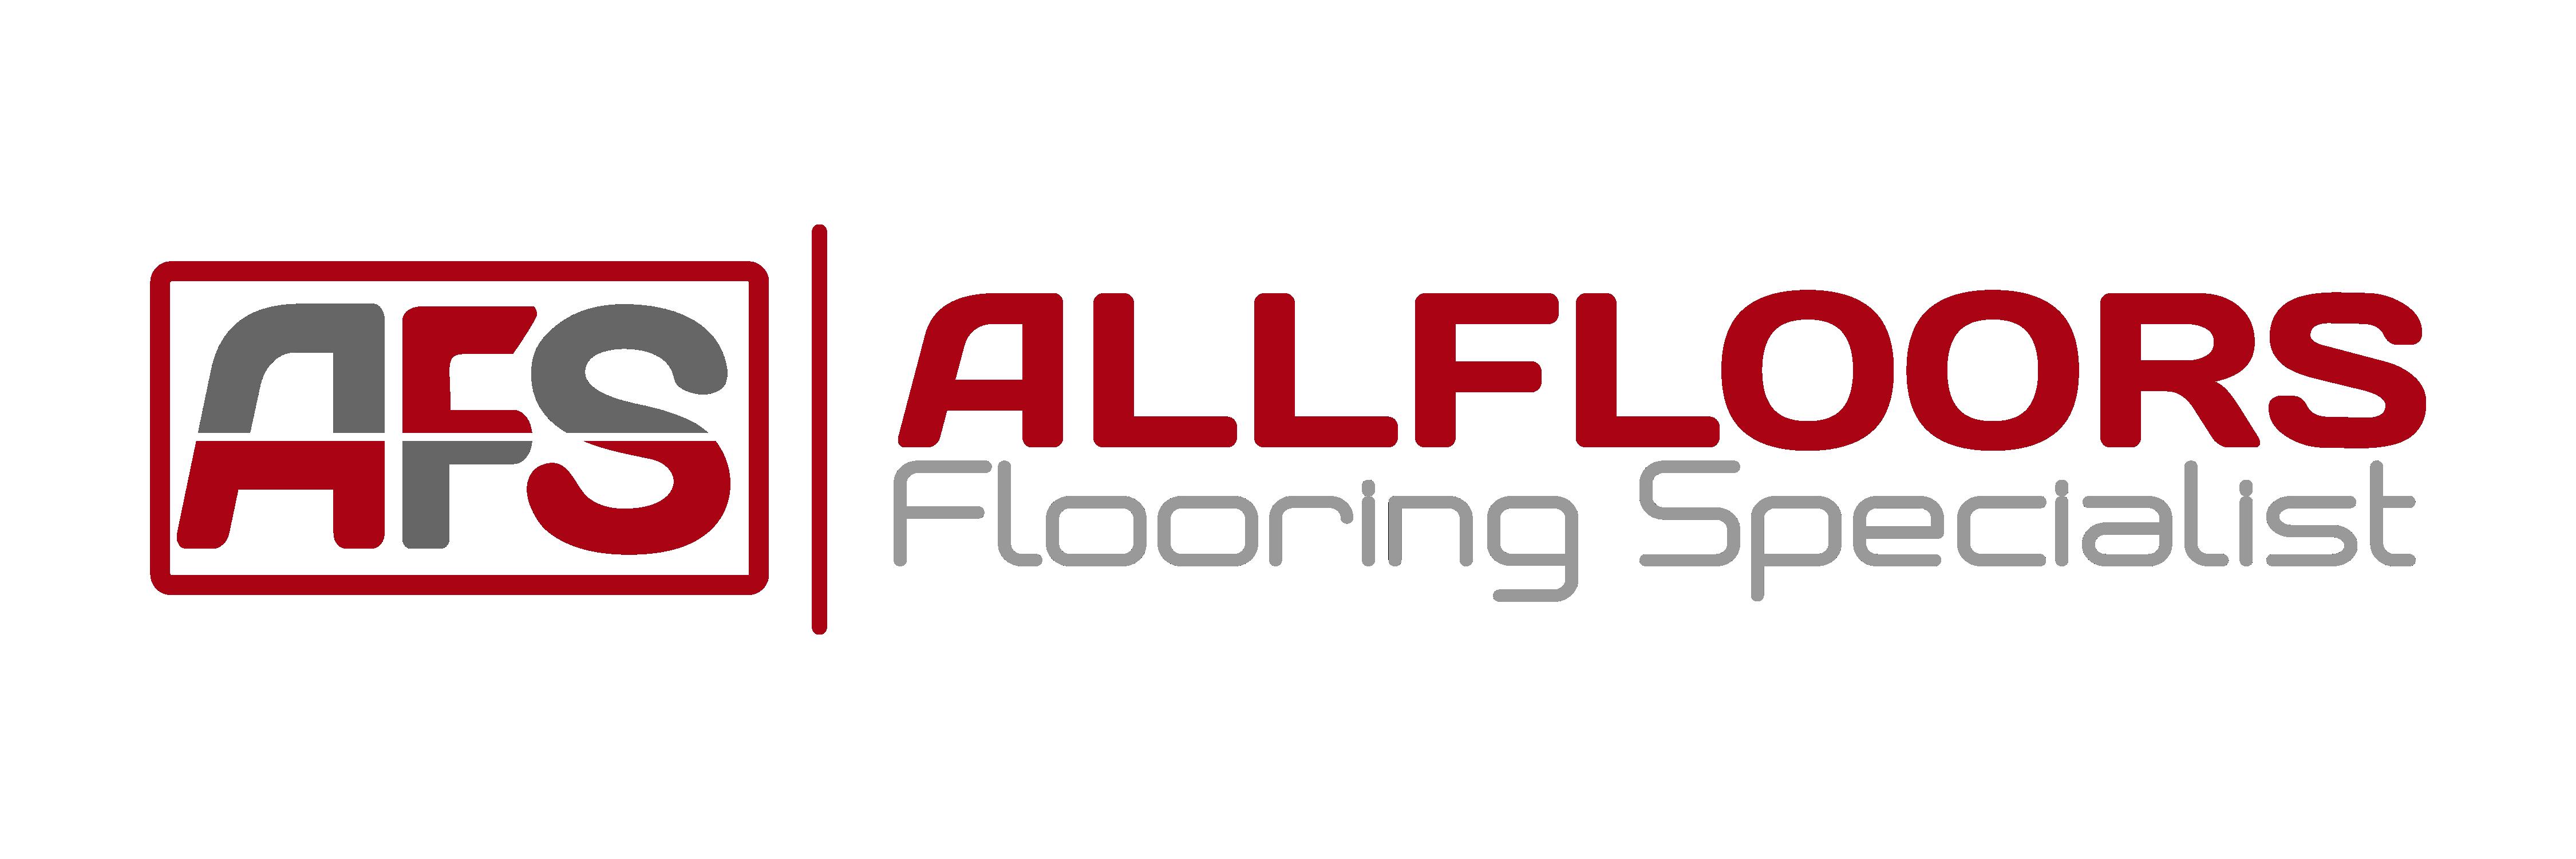 Sanding perth fremantle allfloors. Floor clipart floorboards